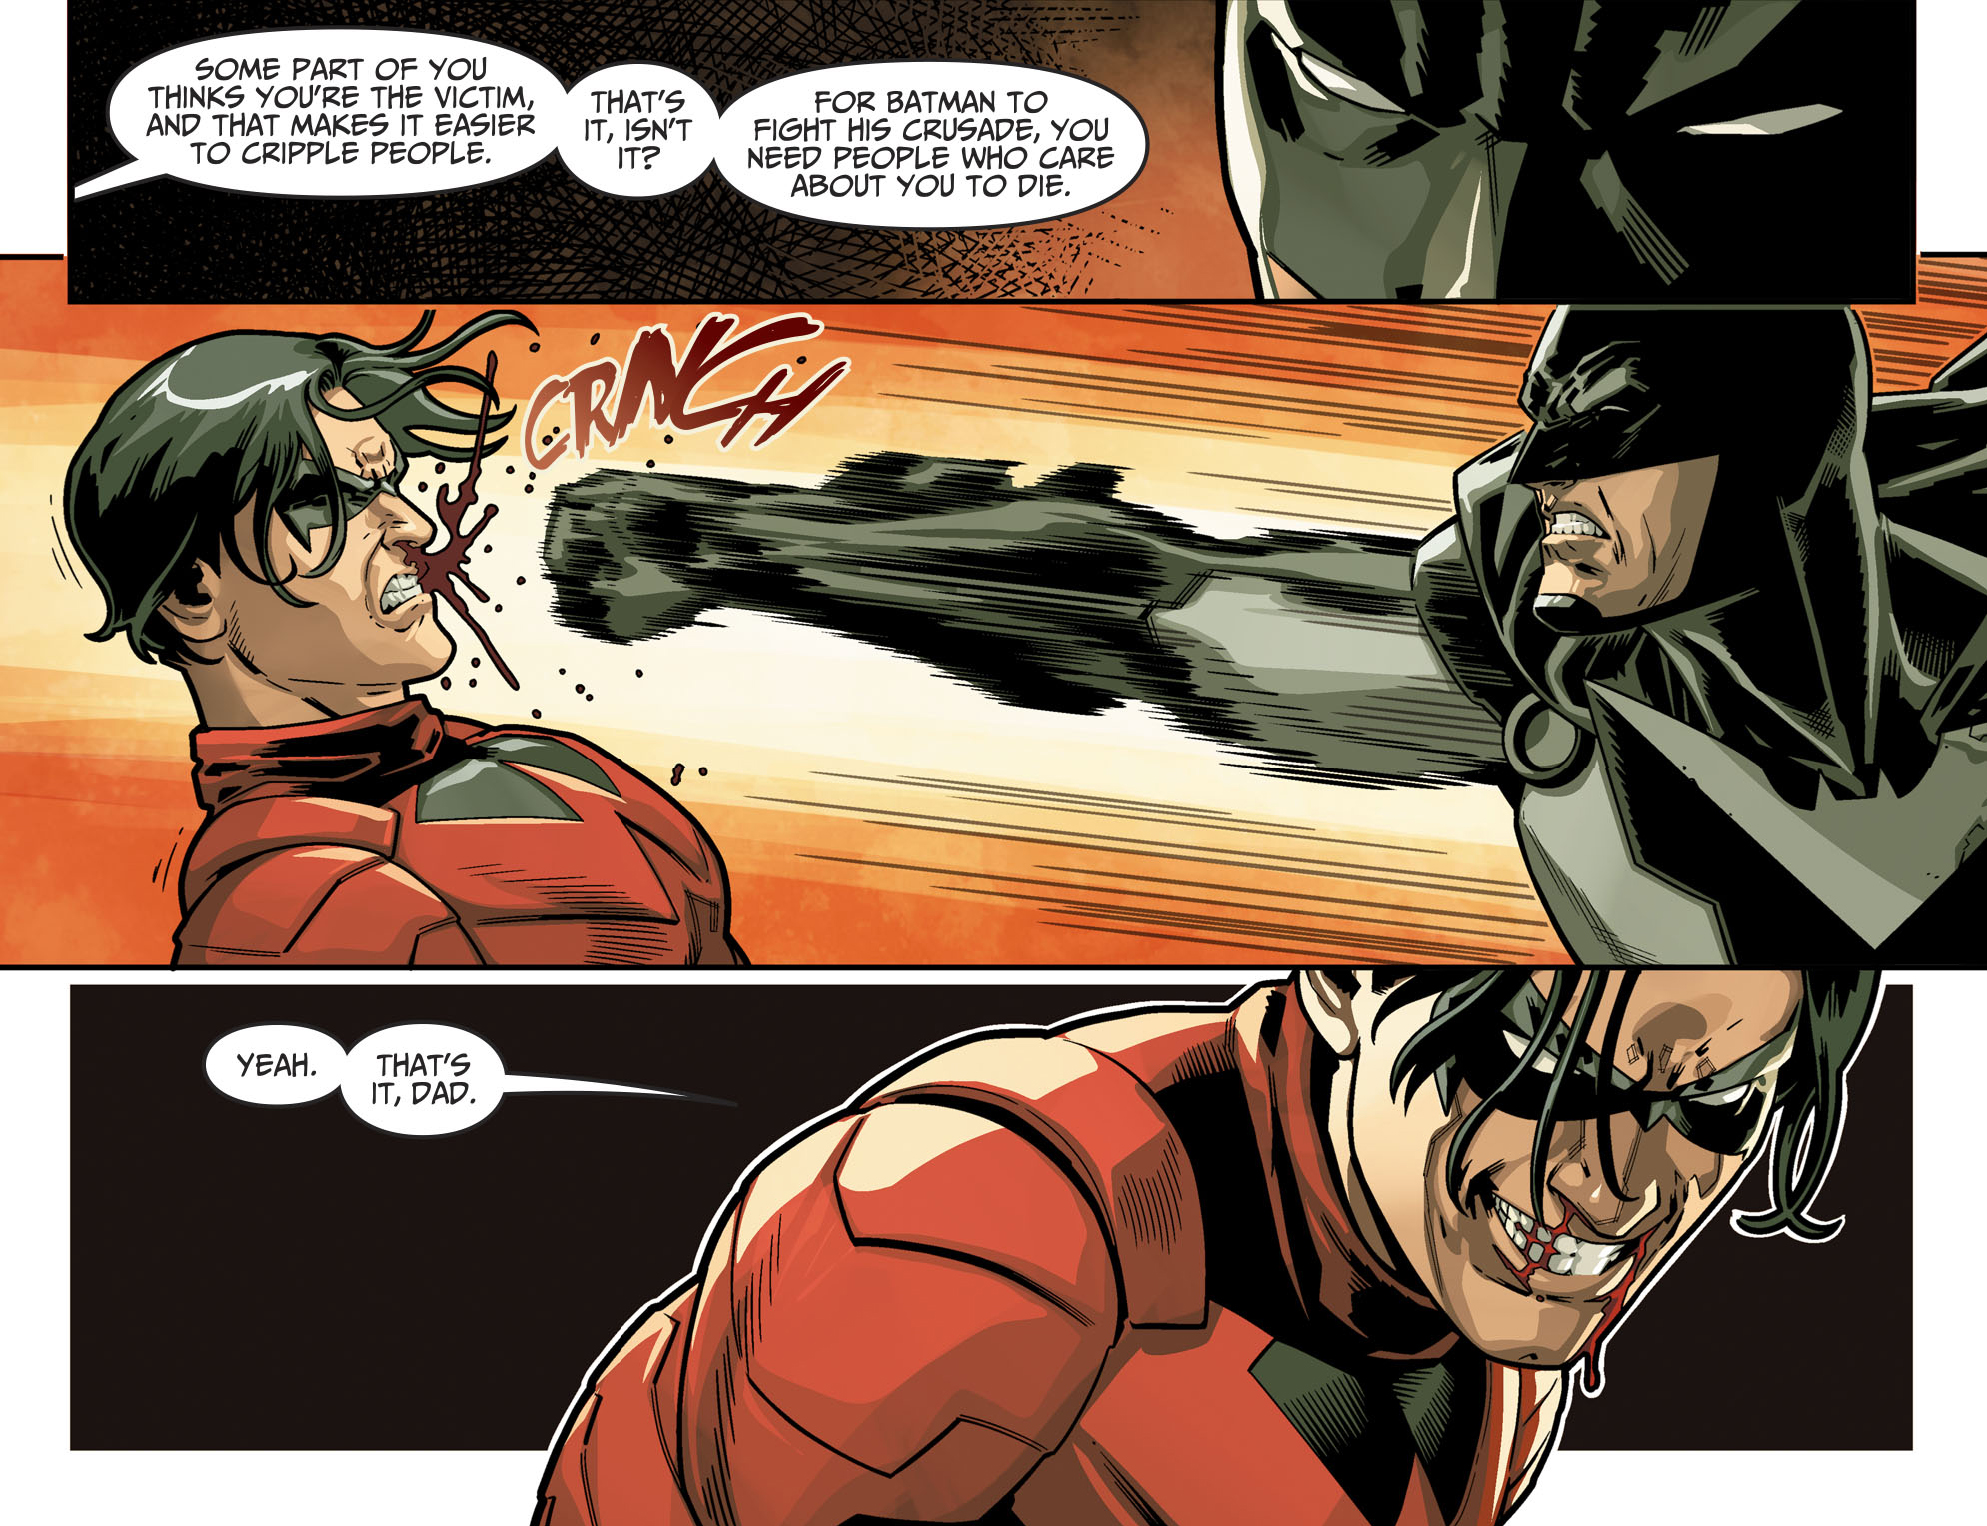 Batman VS Nightwing (Injustice II) | Comicnewbies Nightwing Injustice Comic